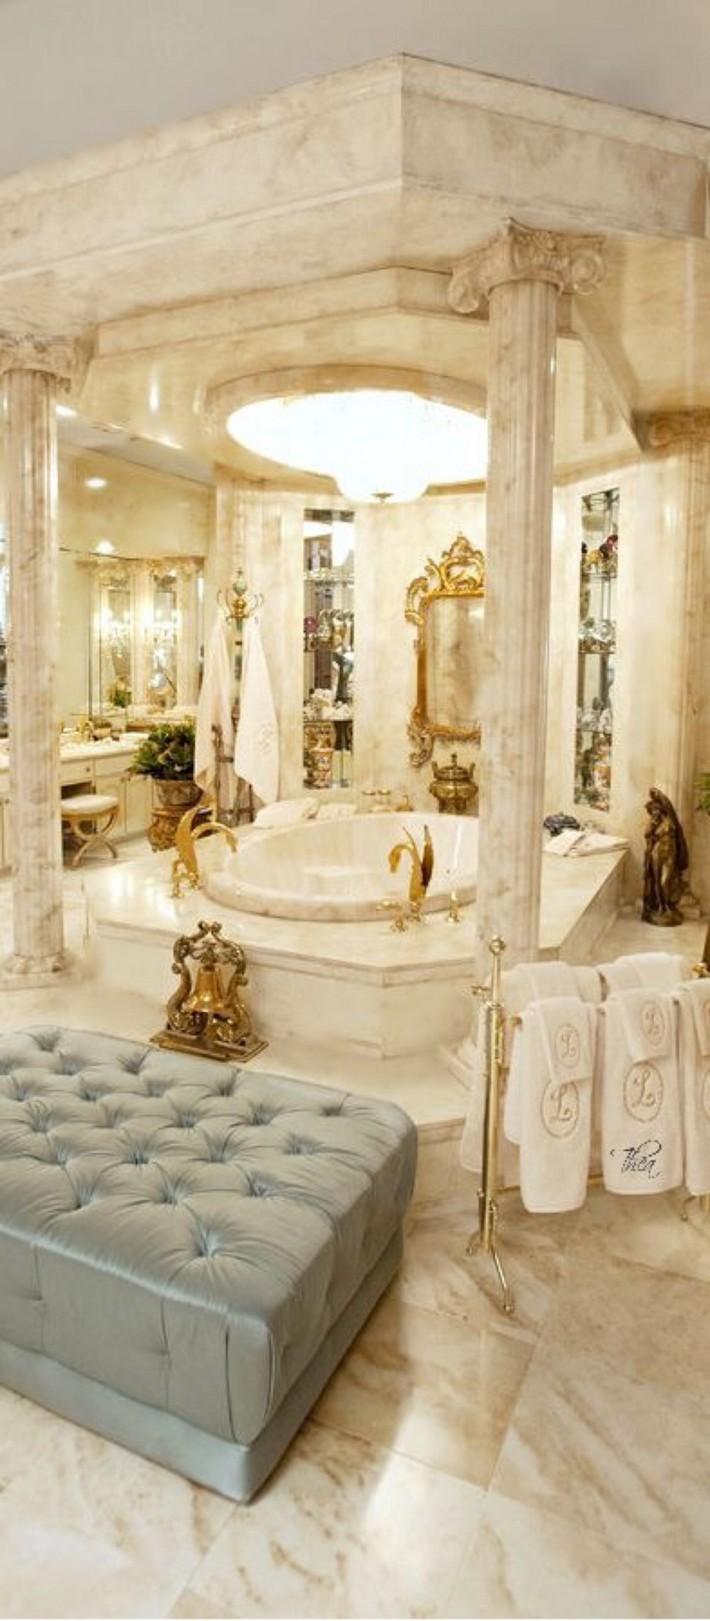 Pictures Of Luxury Bathrooms Luxury Bathrooms Ideas